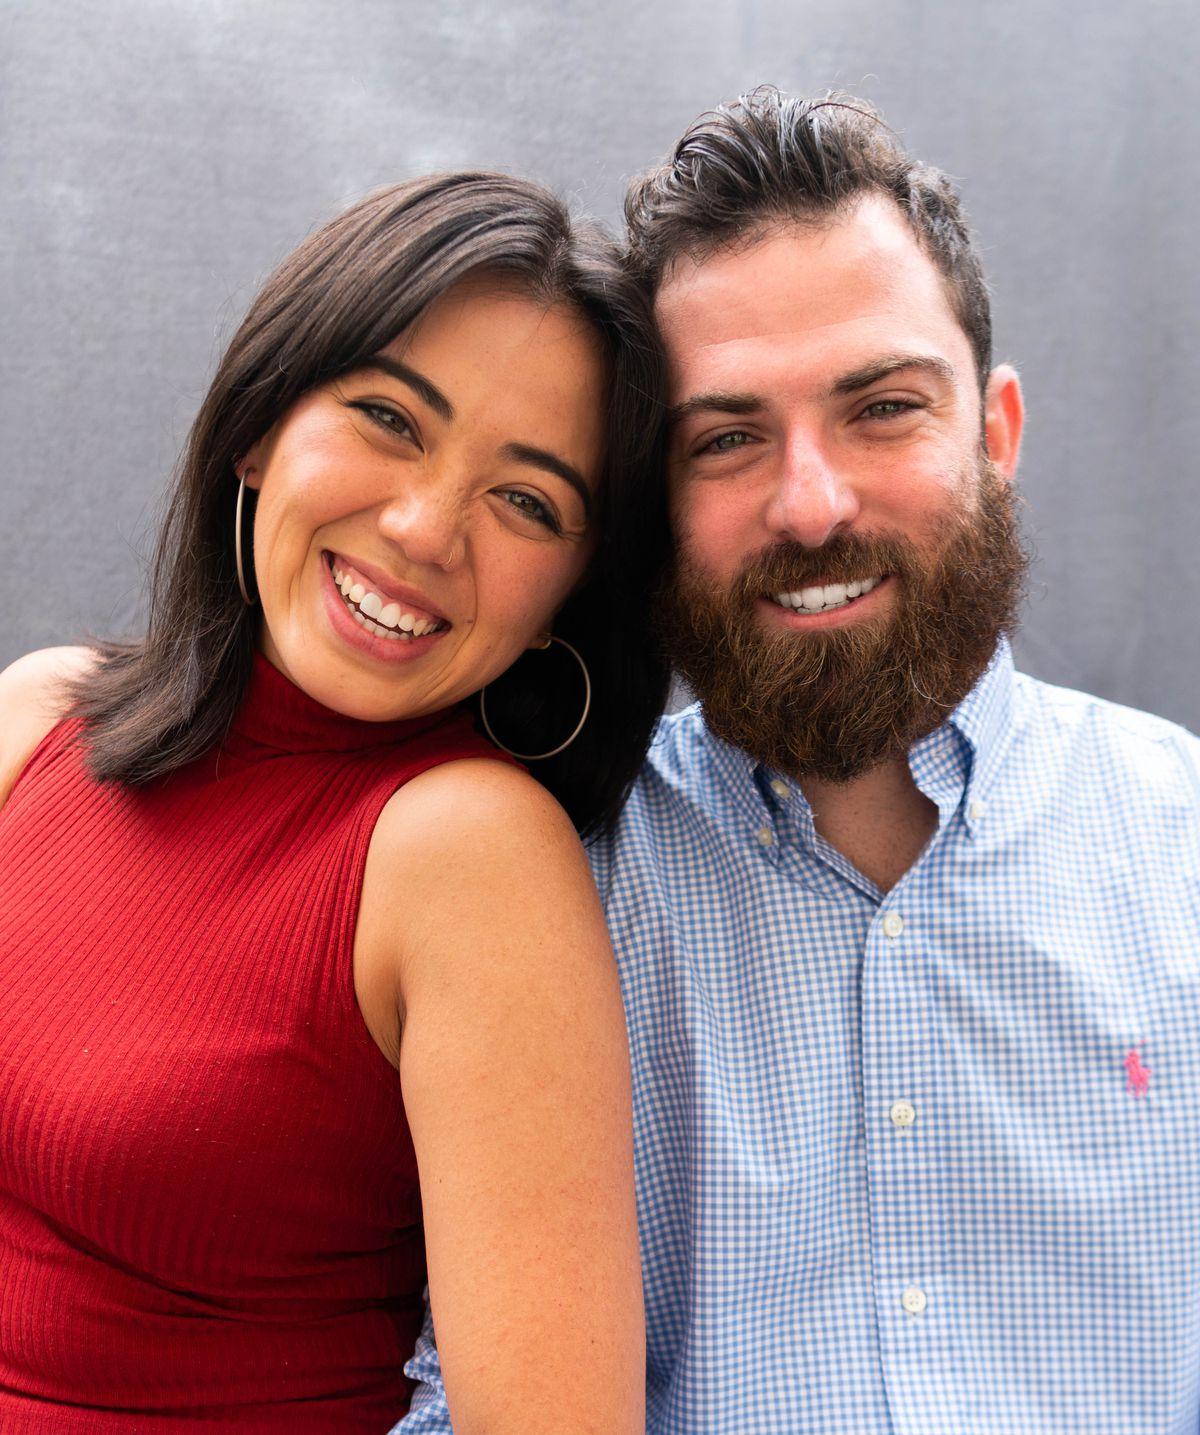 Kelsie Lam and Allan Katzef